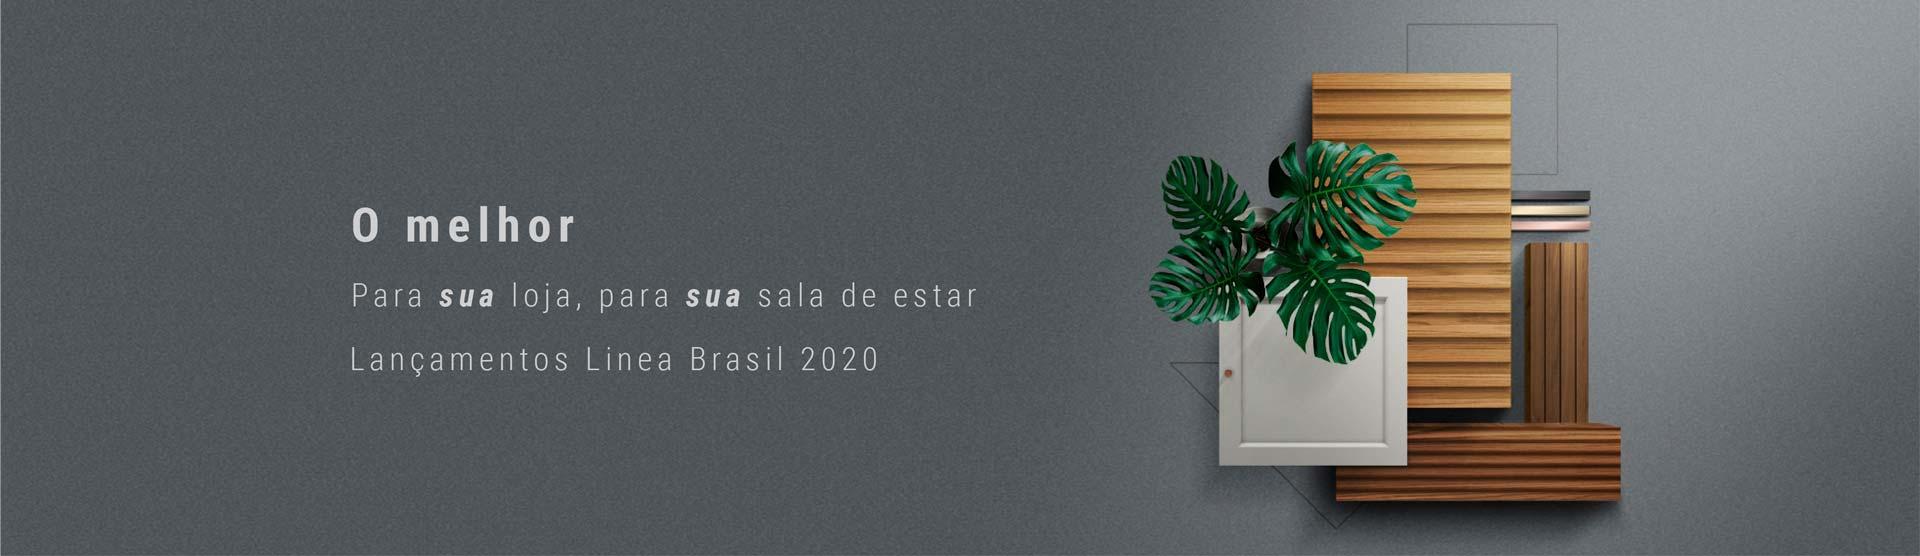 Banner Campanha 2020